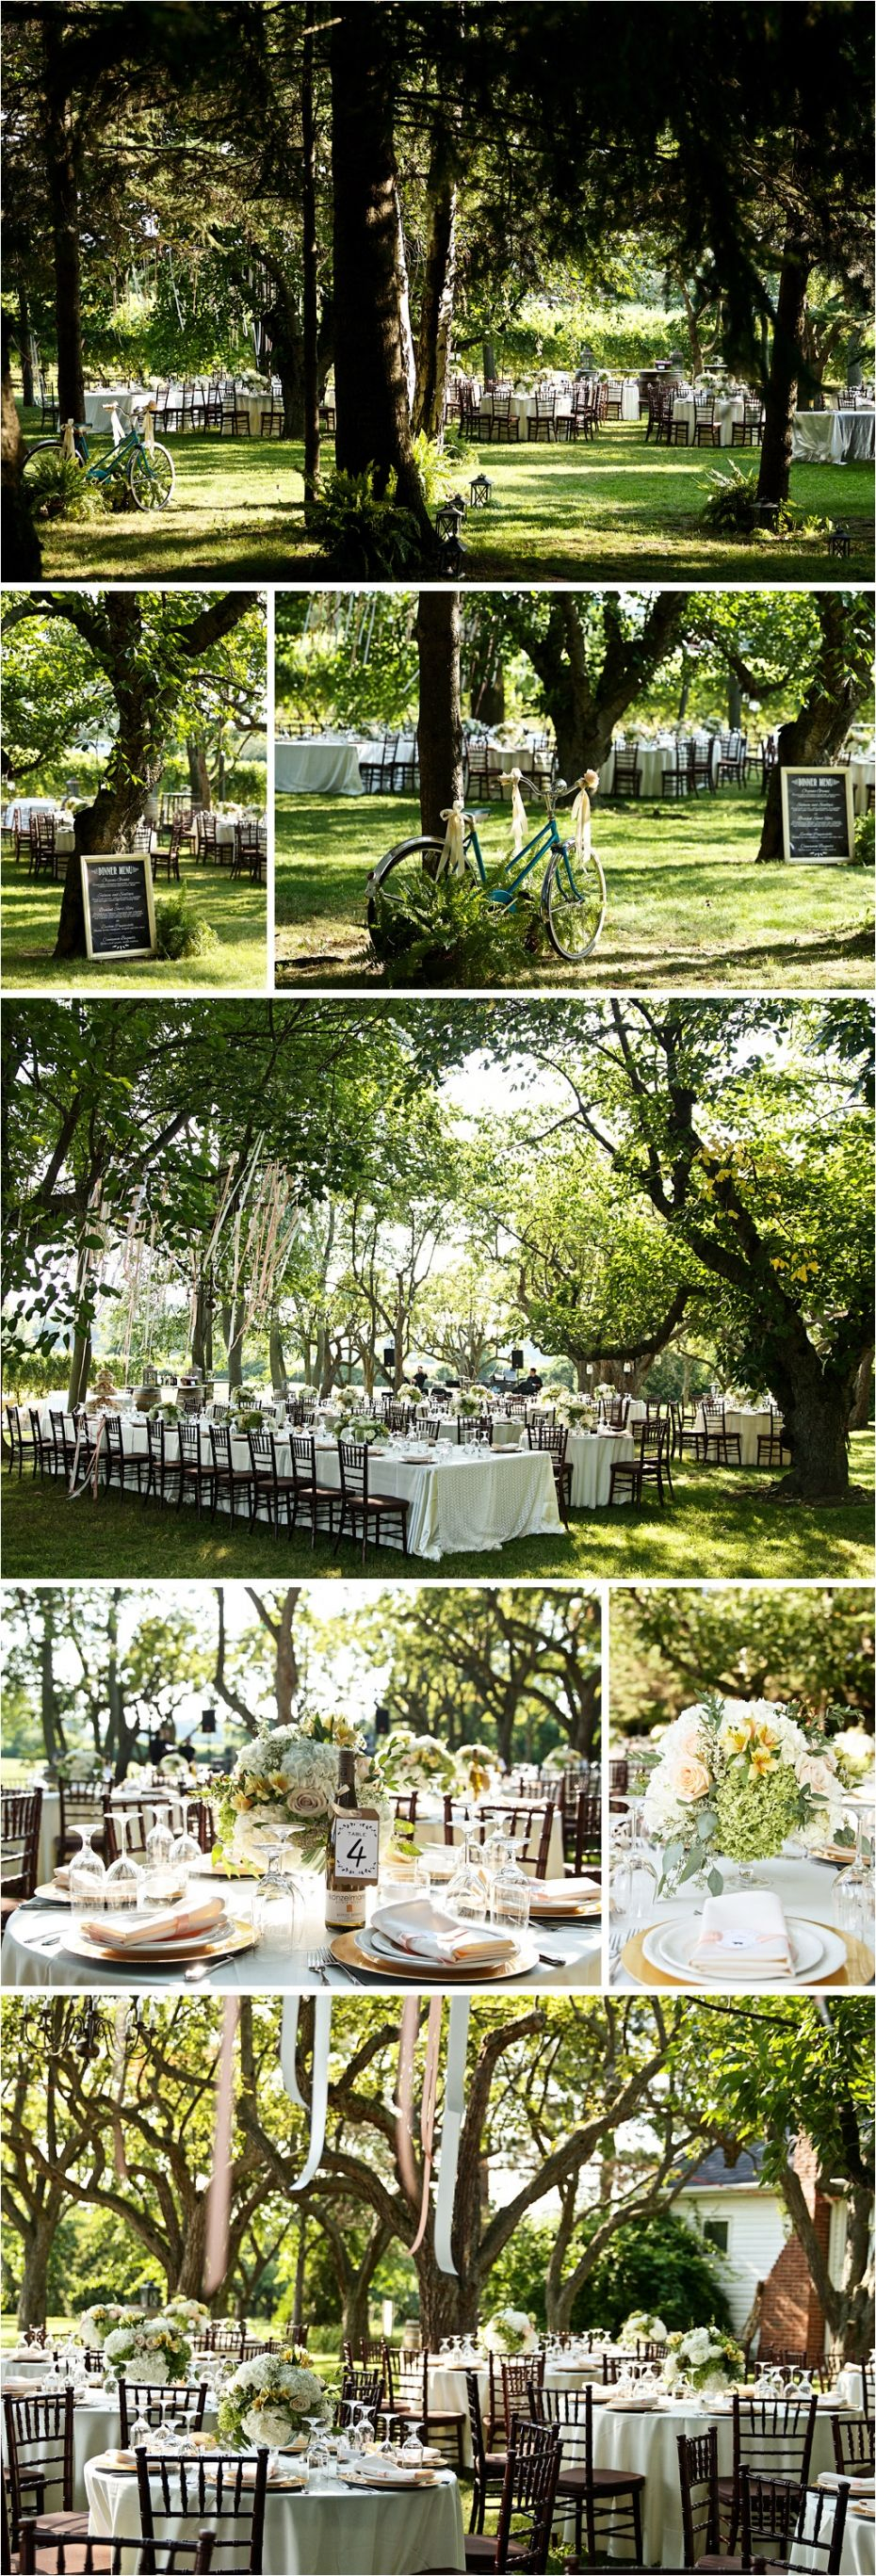 Chelsea And Adam Wedding At Kurtz Orchards Gracewood Estates Niagara On The Lake Fa Wedding Venues Ontario Wedding Venues Toronto Outdoor Wedding Venues